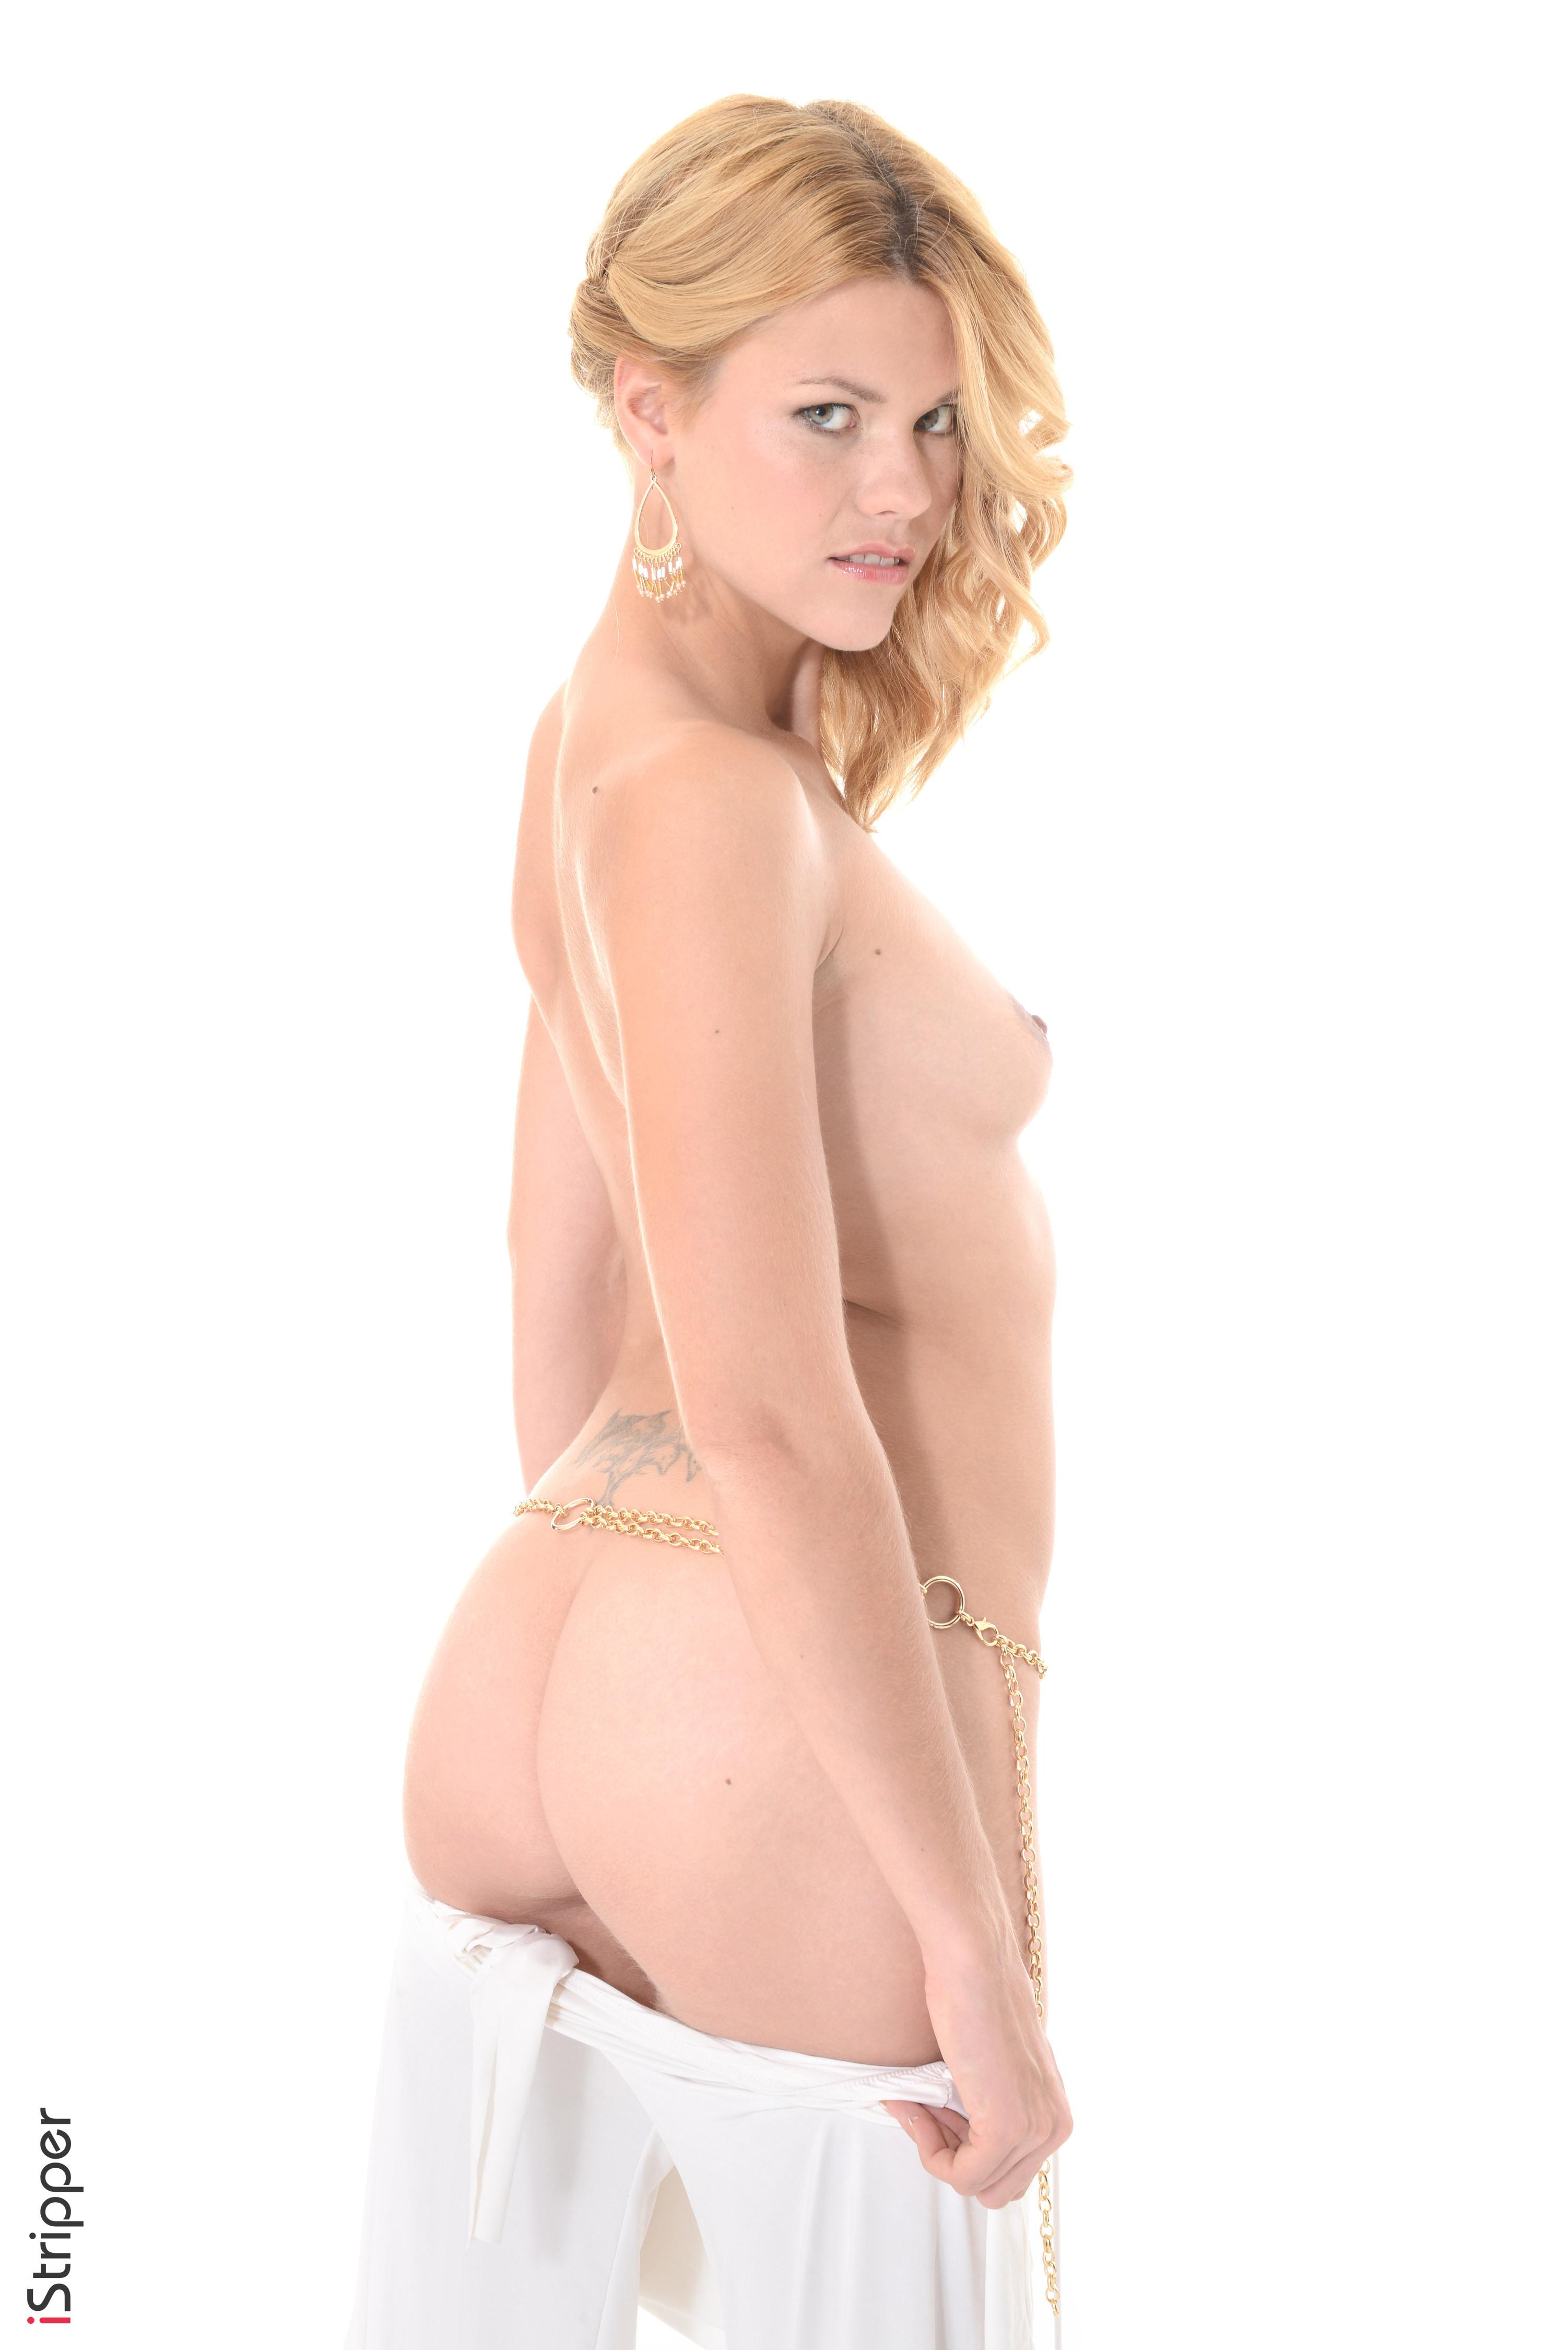 nude asian wallpaper